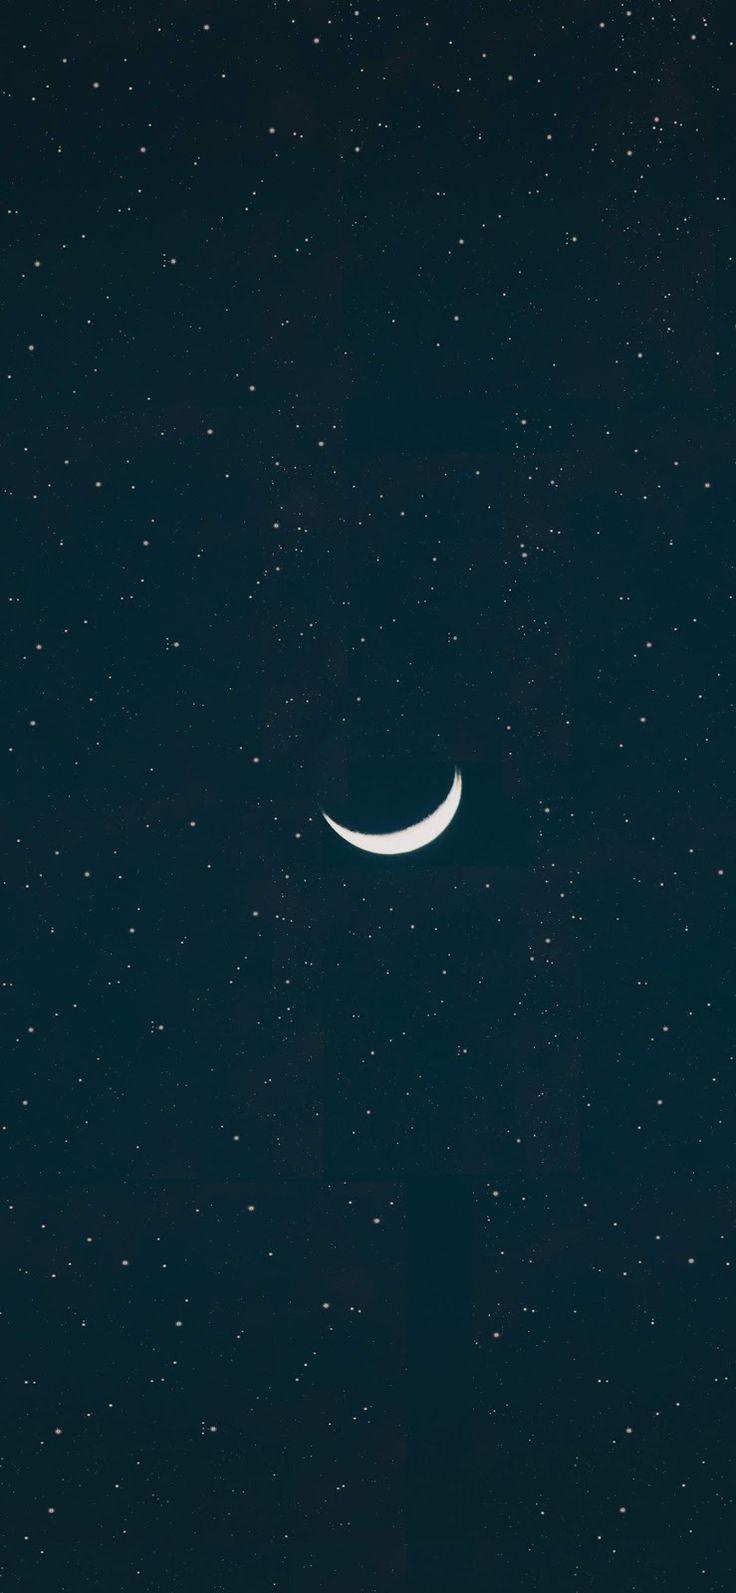 Crescent Moon Wallpaper Iphone X Wallpaper Iphone Gambar Bunga